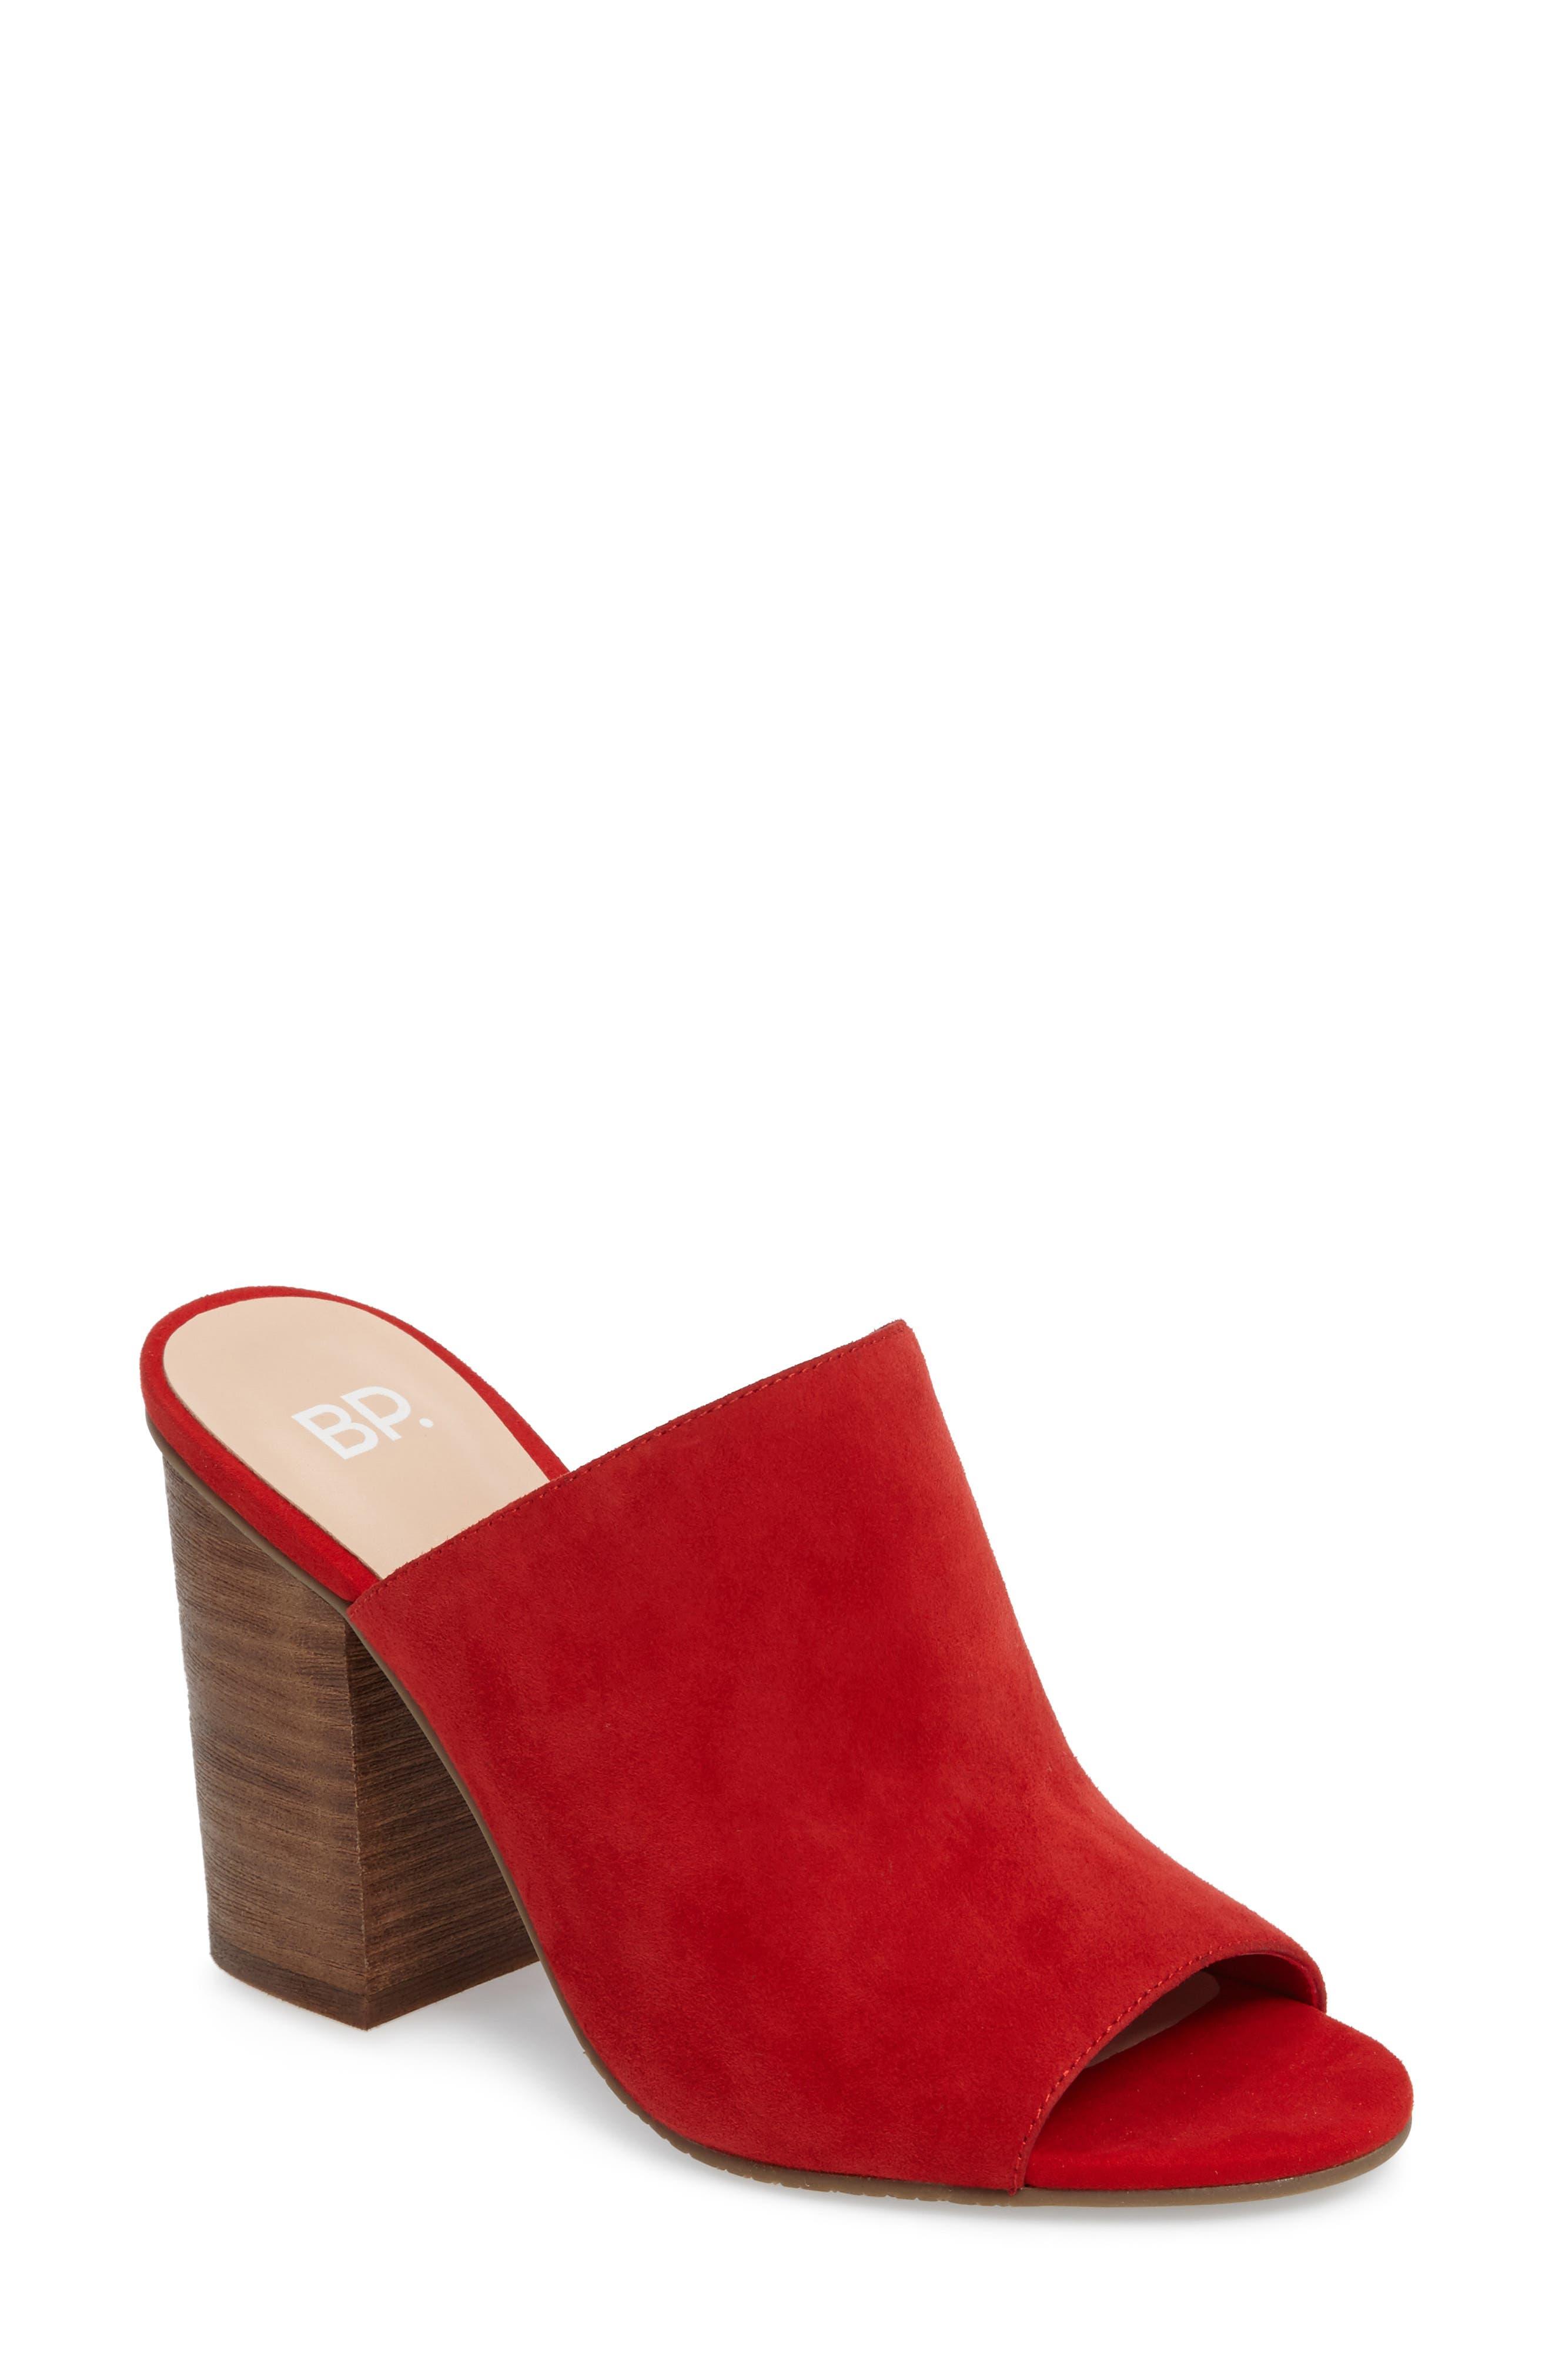 Main Image - BP. Tale Block Heel Sandal (Women)